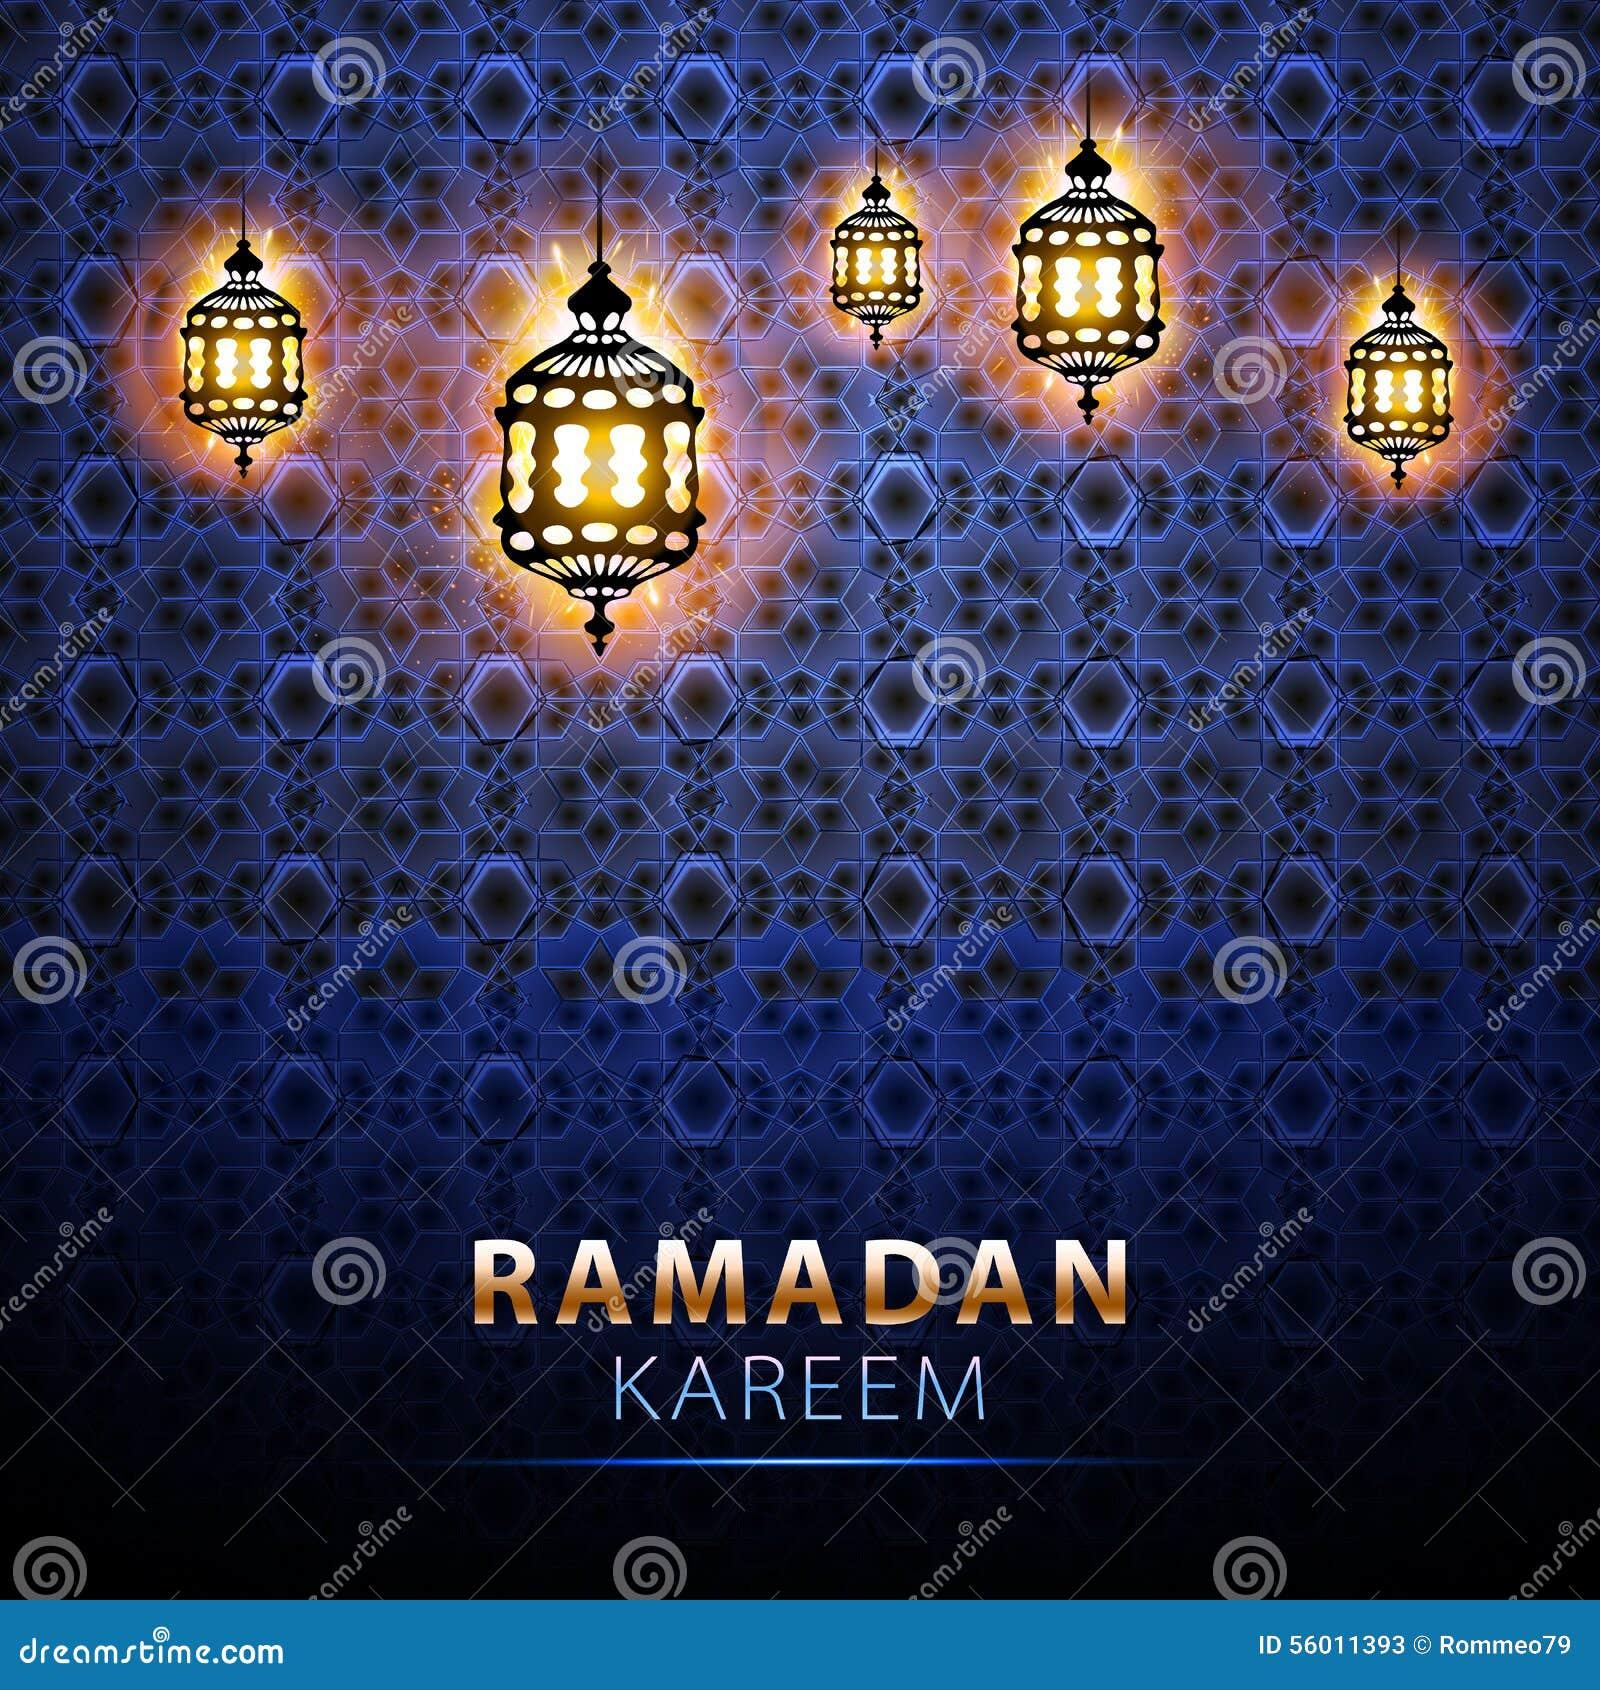 Traditional Lantern Ramadan Kareem Art Beautiful Stock Vector Illustration Of Message Arabian 56011393